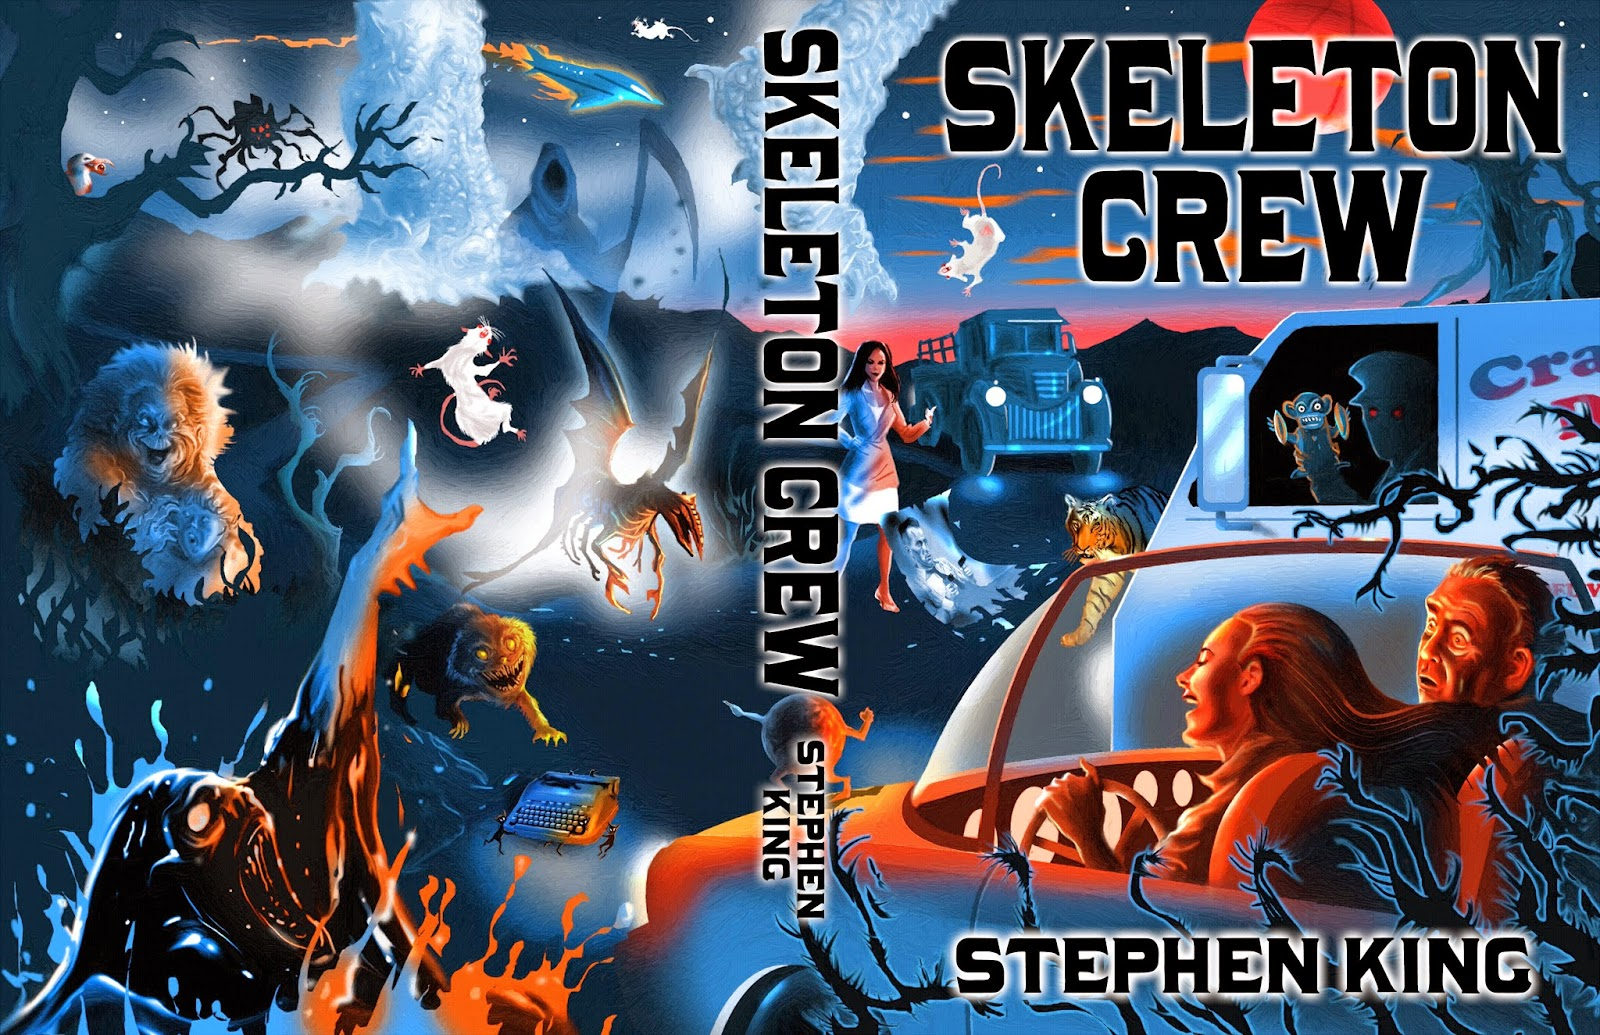 VONSHOLLYWOOD: SKELETON CREW by Stephen King